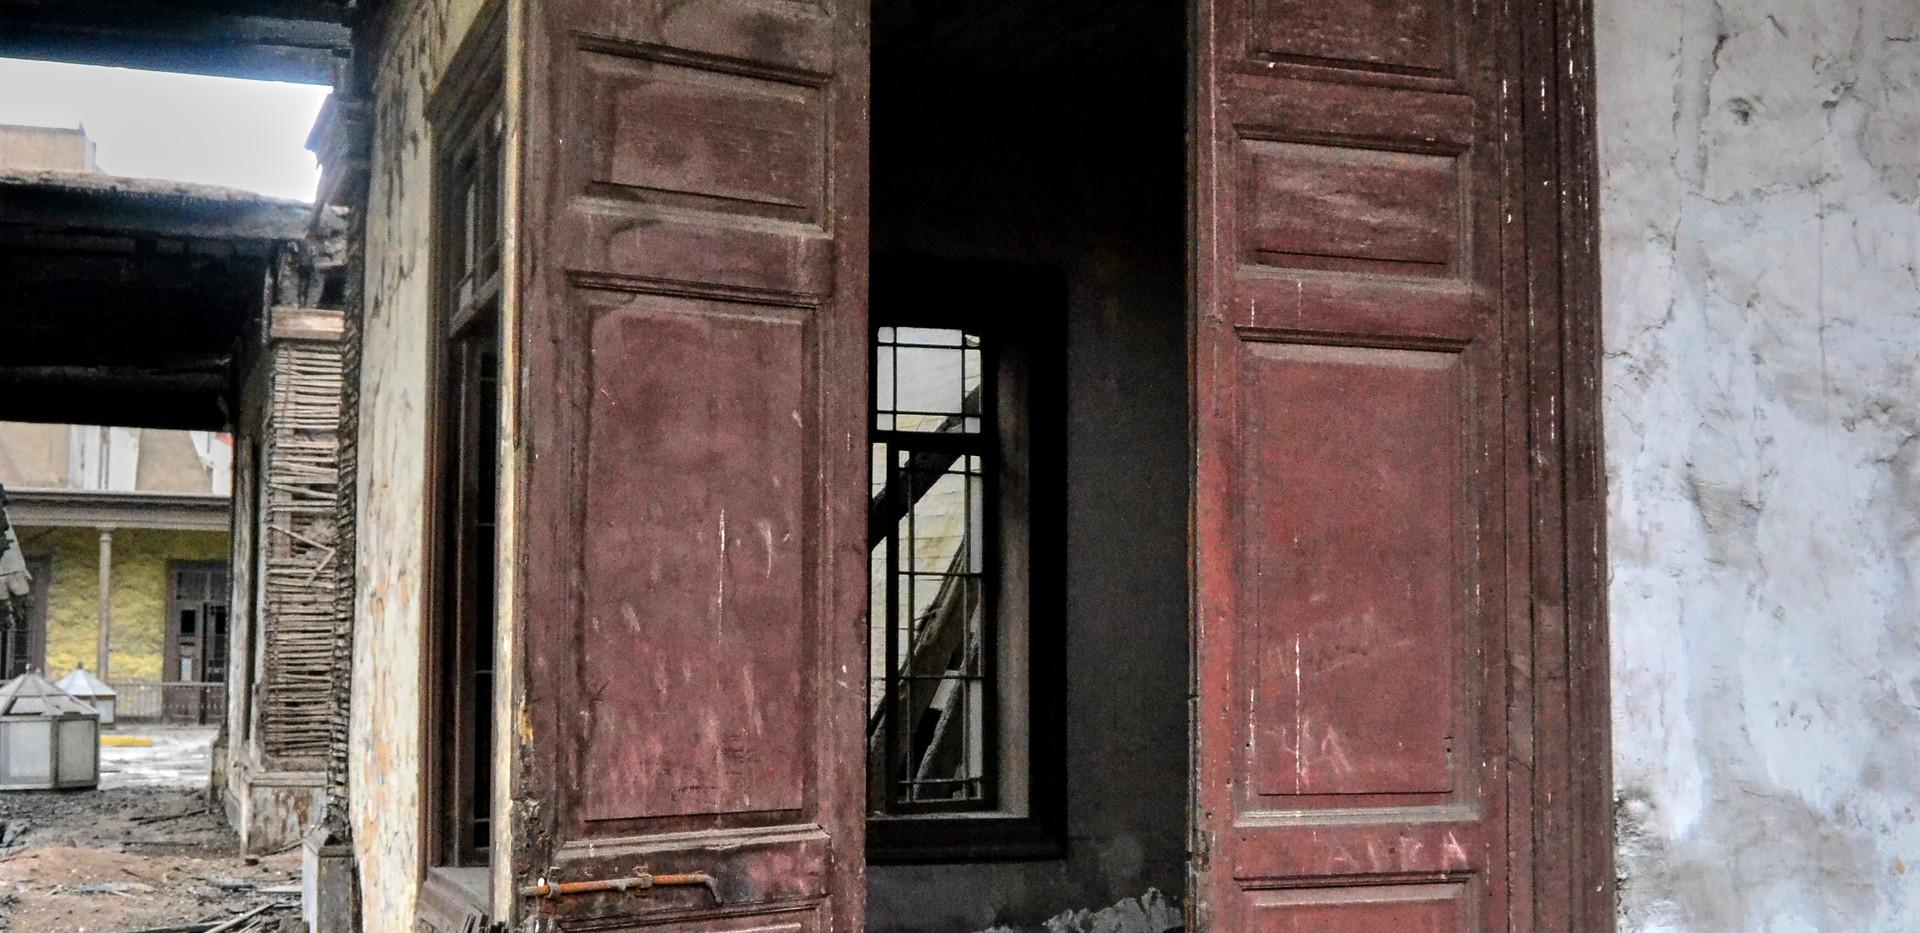 Colegio Real _ Puertas 2do piso 1.jpg